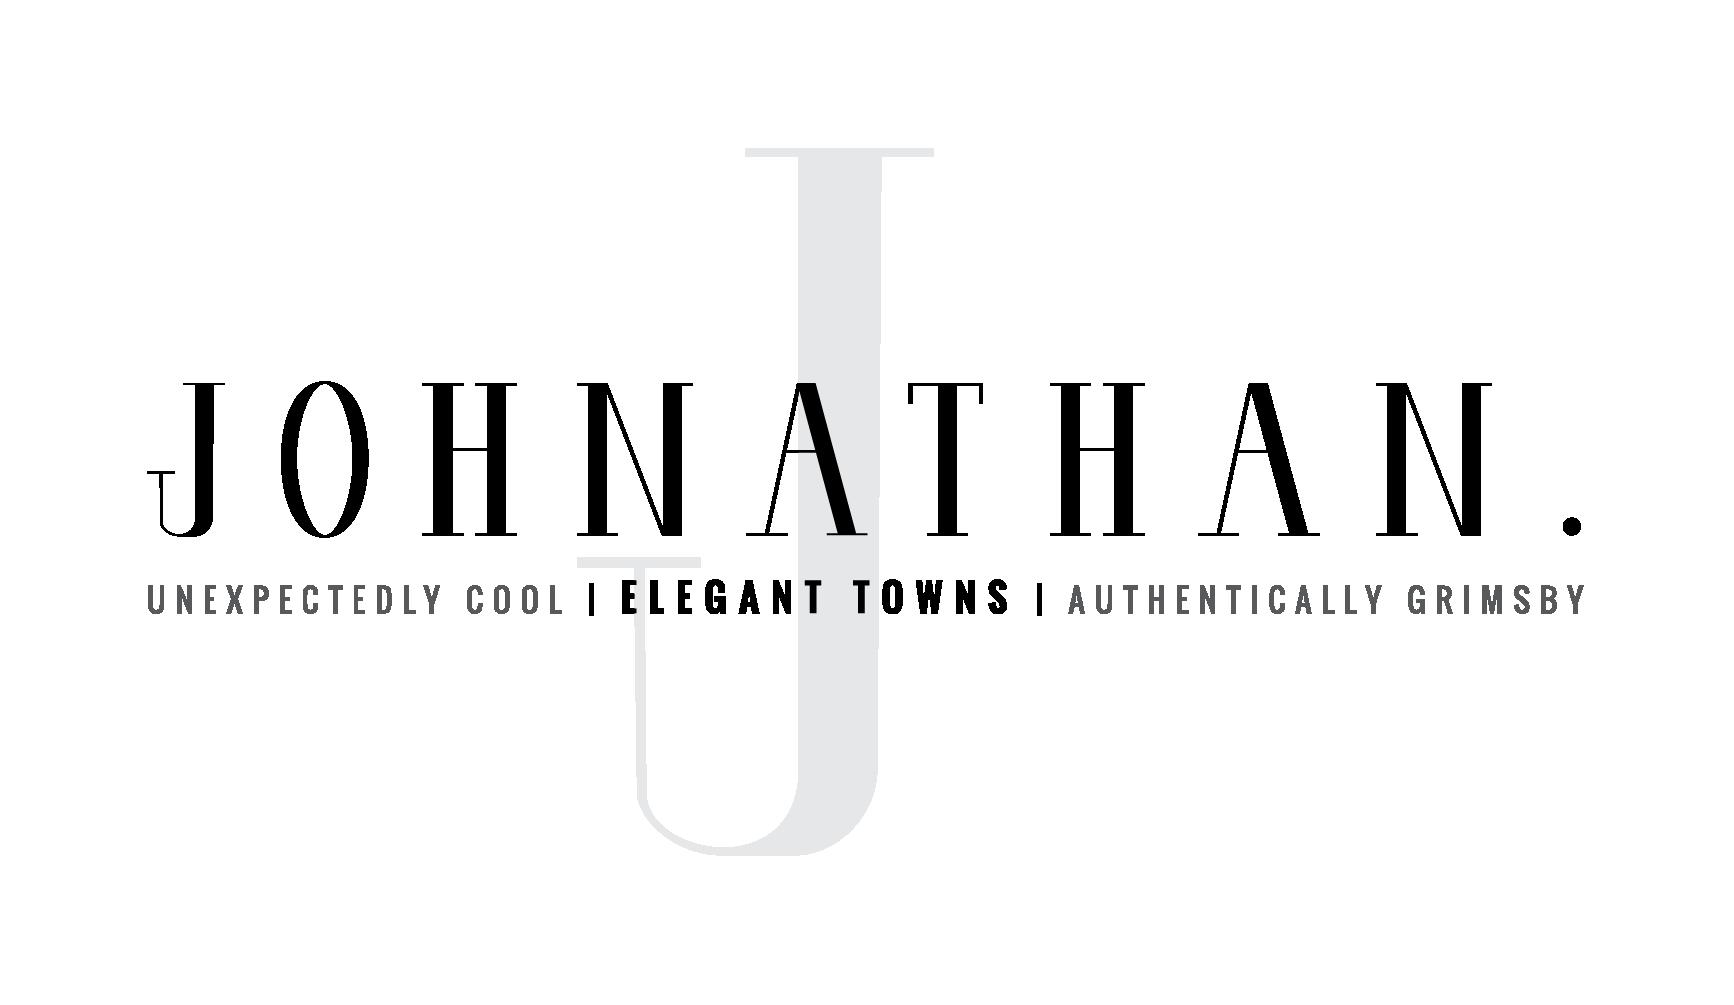 Phelps_Johnathan_01B-Logo_with_J_and_tagline-GREY_NO_TRANSPARENCY